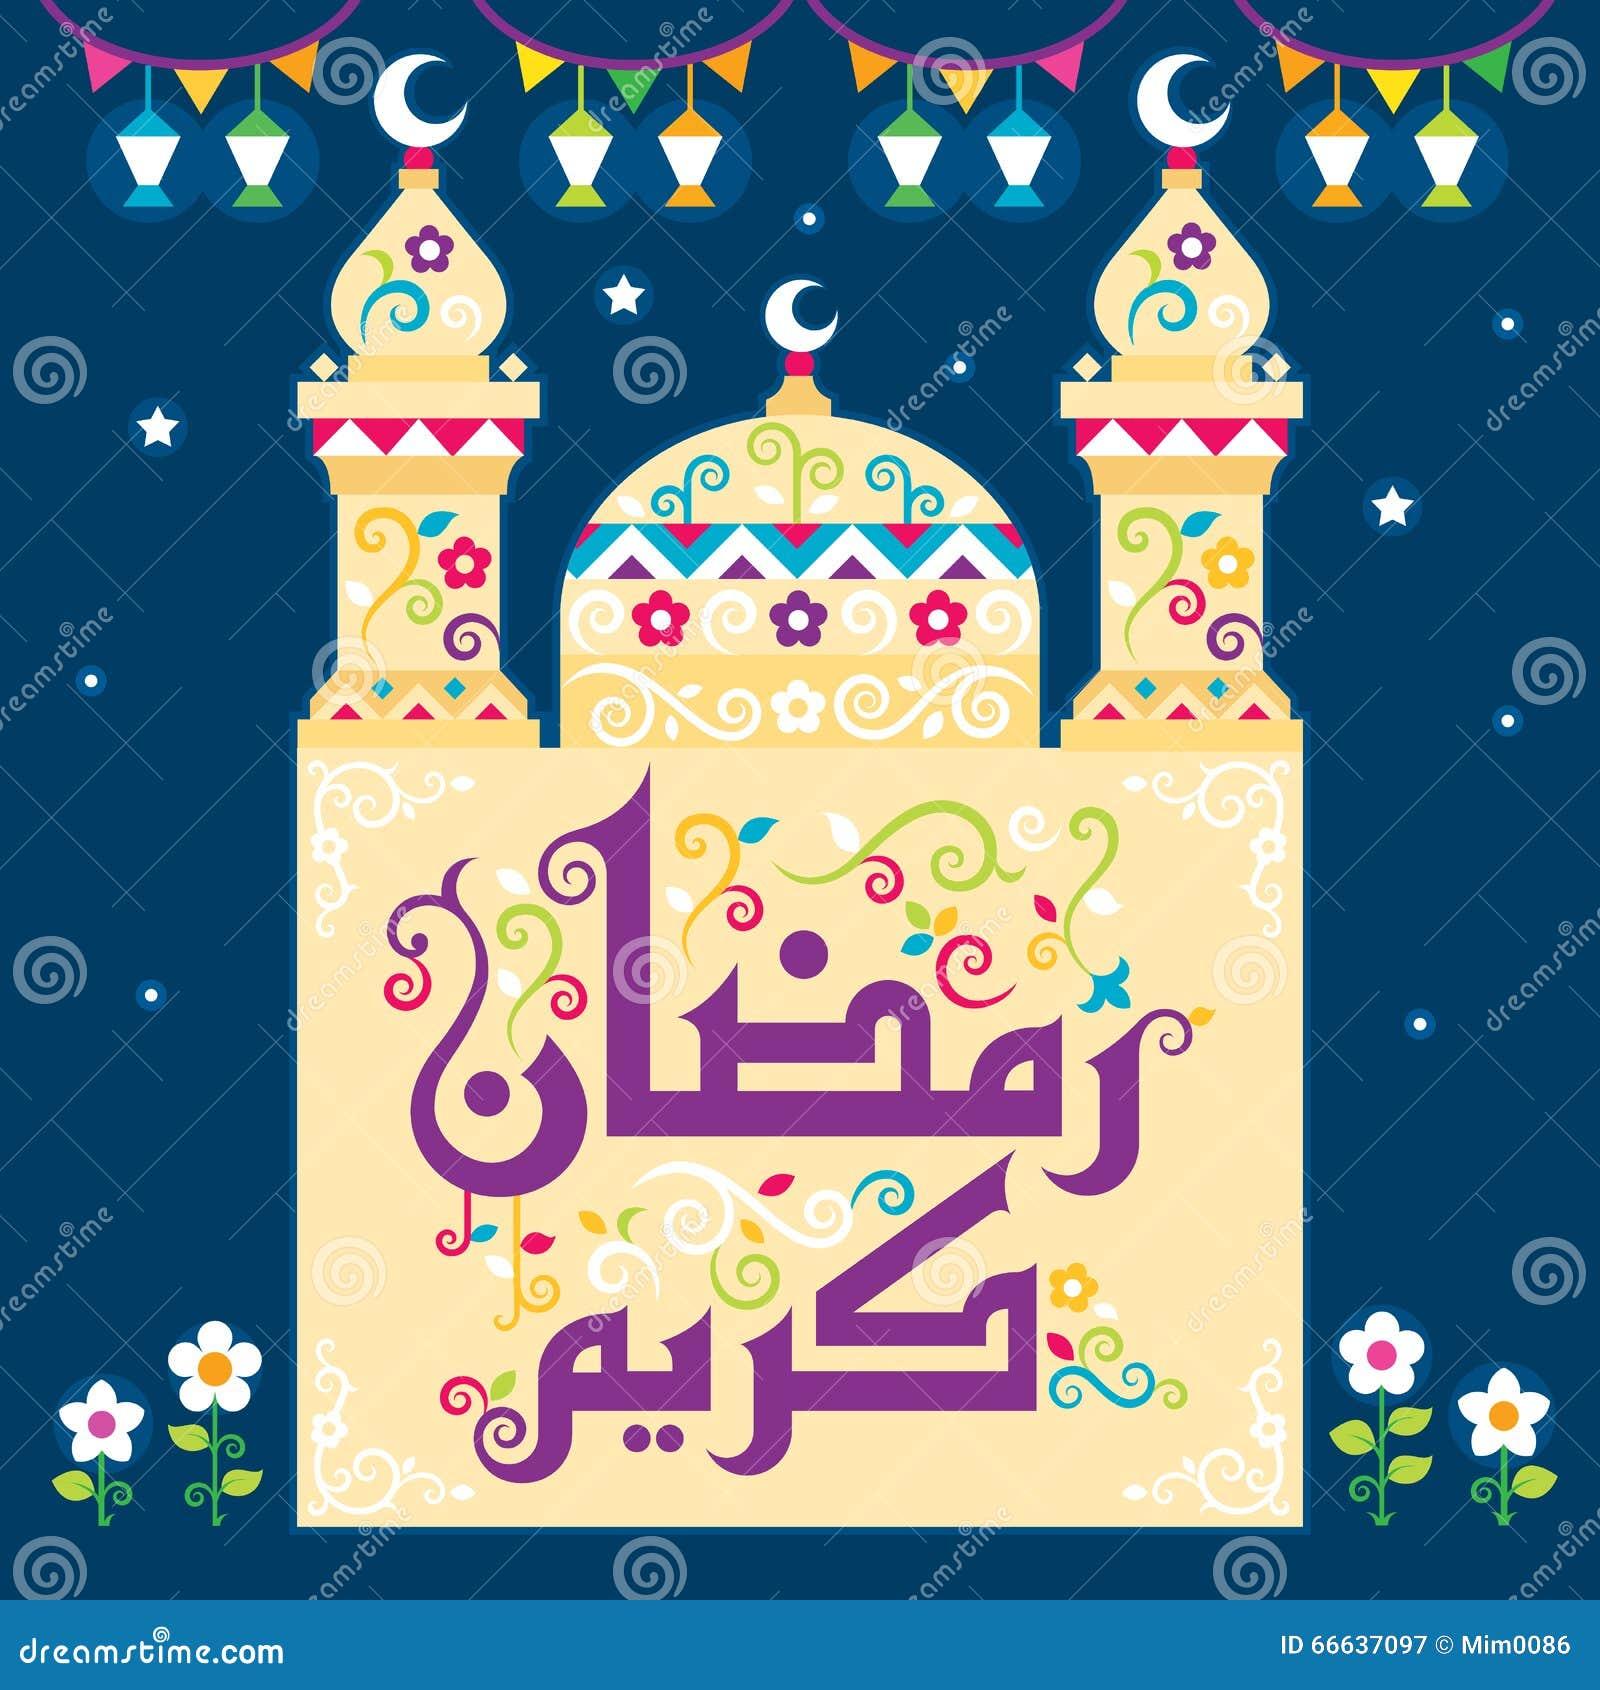 Translation Happy Ramadan Is The Ninth Month Of Muslim Calendar Written In Arabic